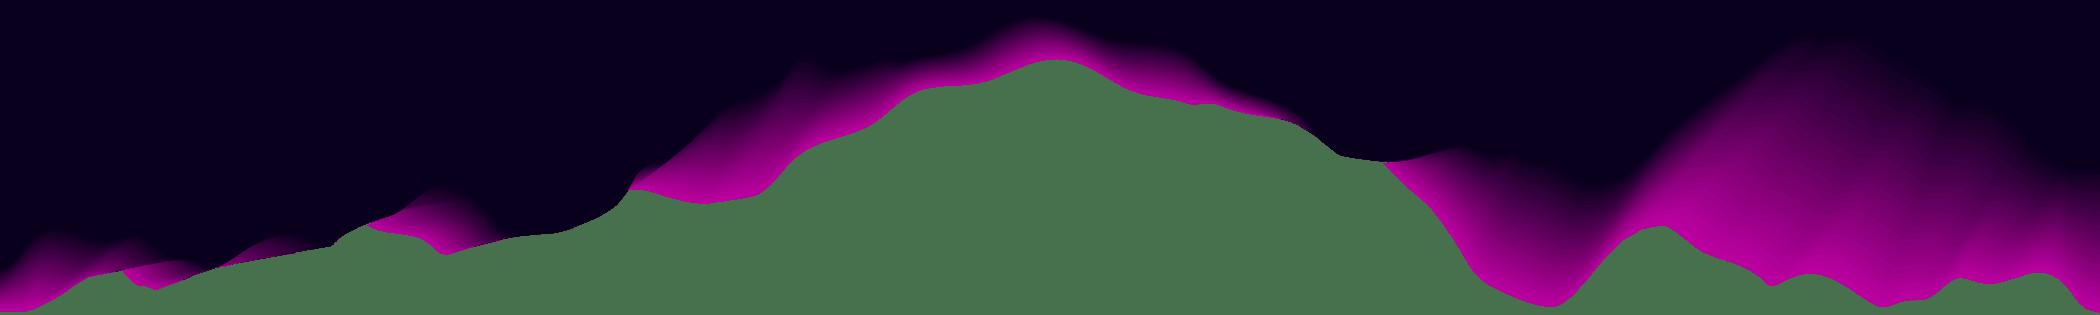 https://i2.wp.com/astroserwis.com/wp-content/uploads/2018/05/purple_bottom_divider.png?fit=2100%2C315&ssl=1